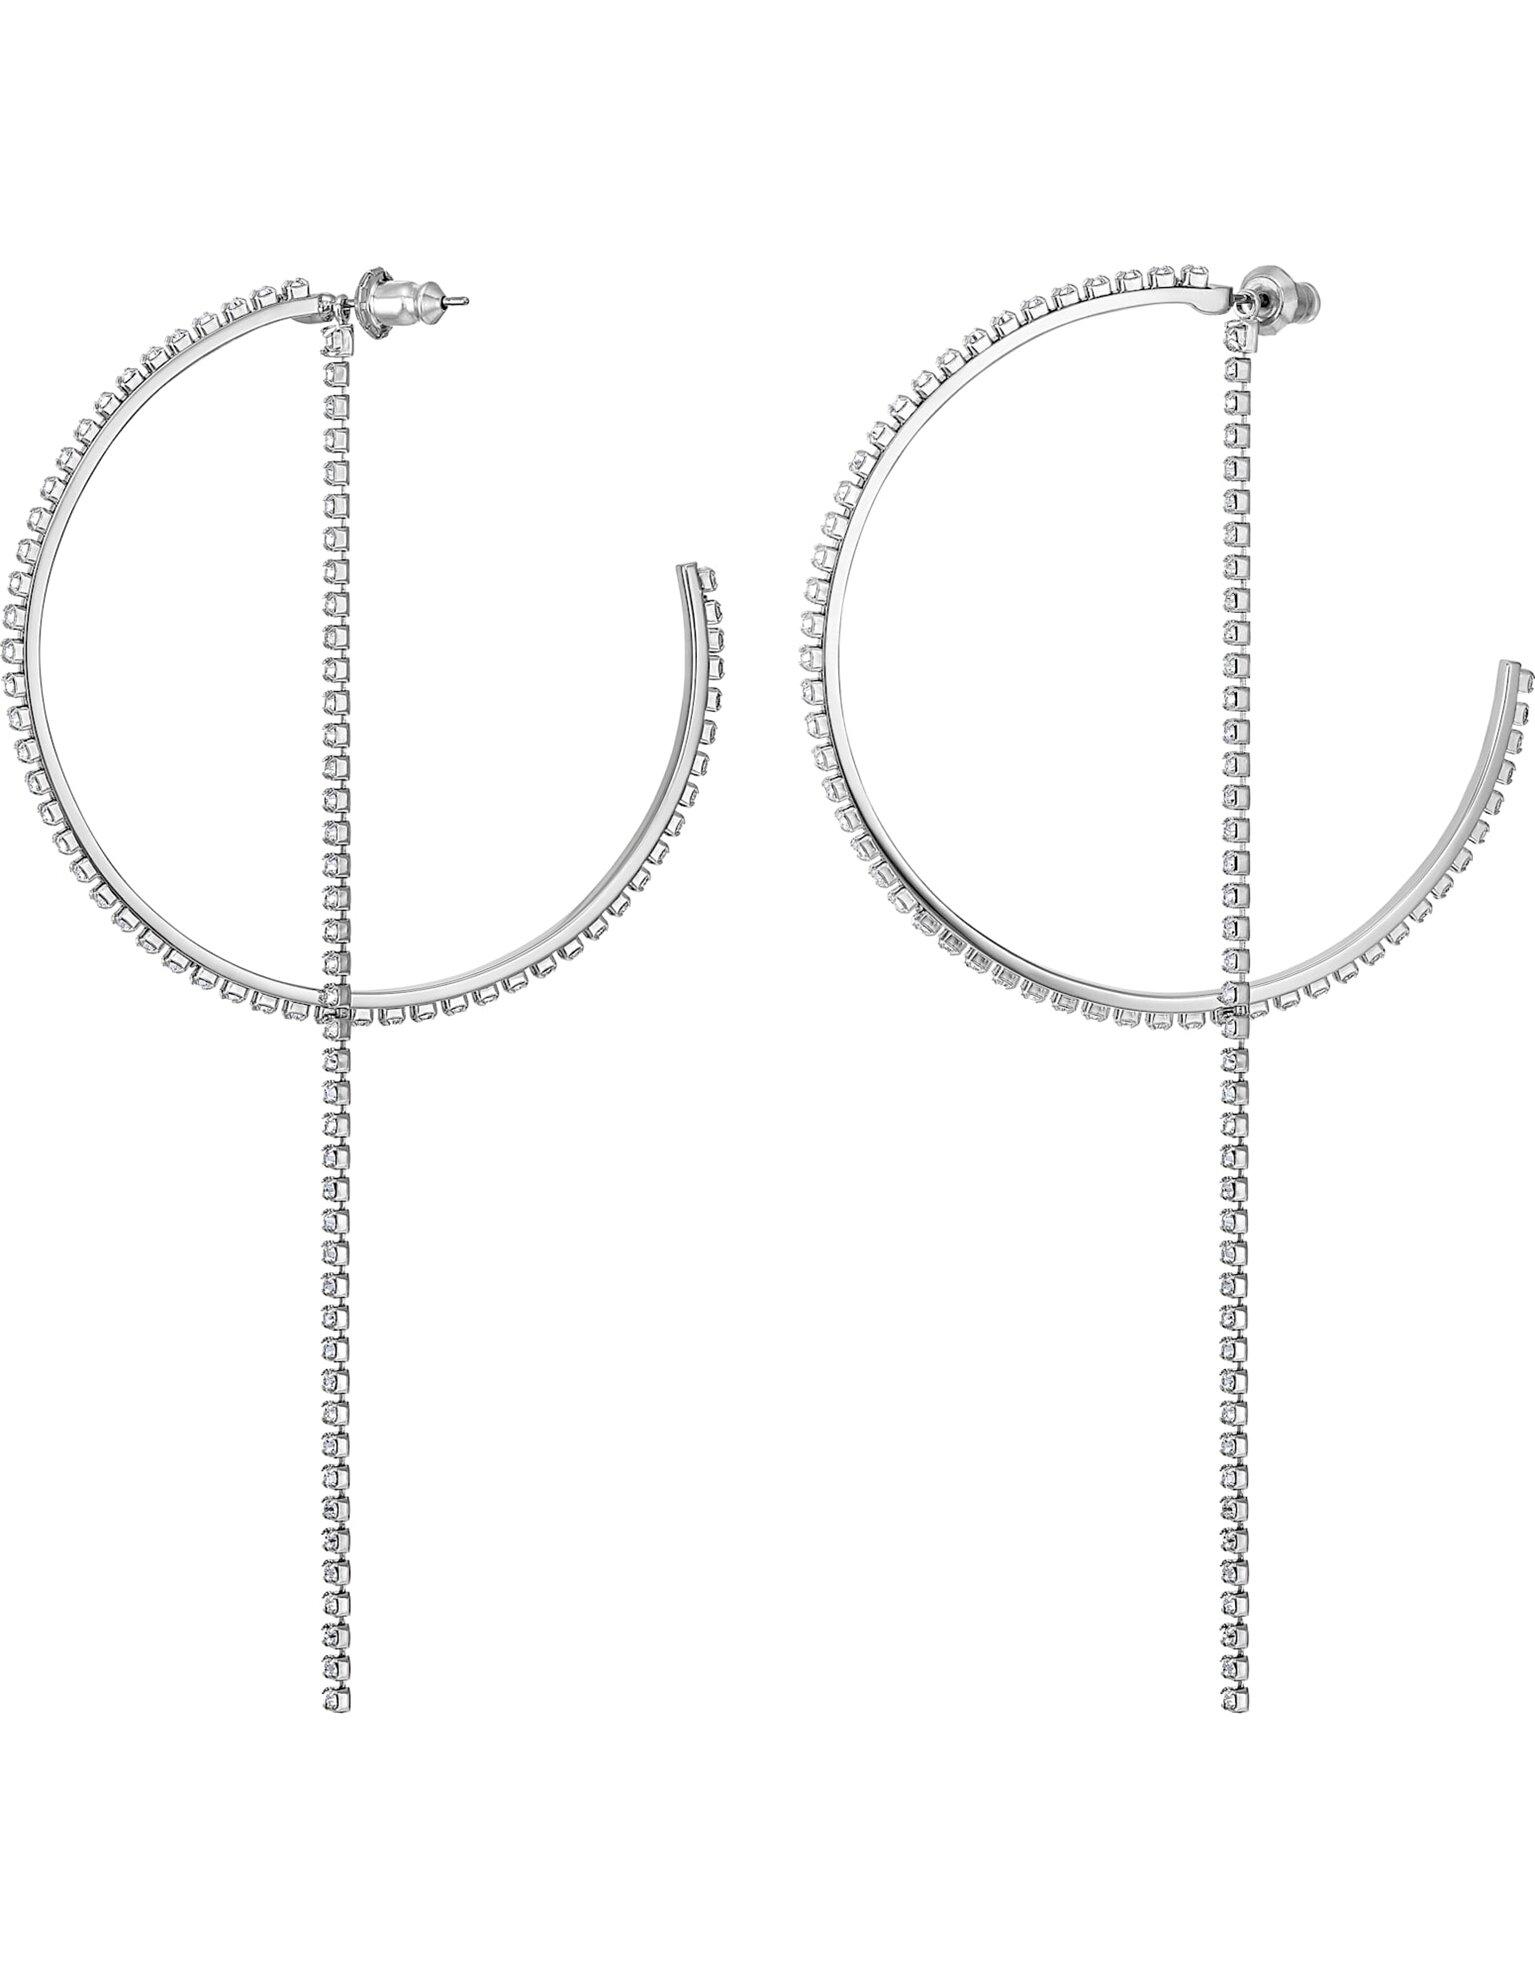 Picture of Fit Halka Küpeler, Beyaz, Paslanmaz çelik